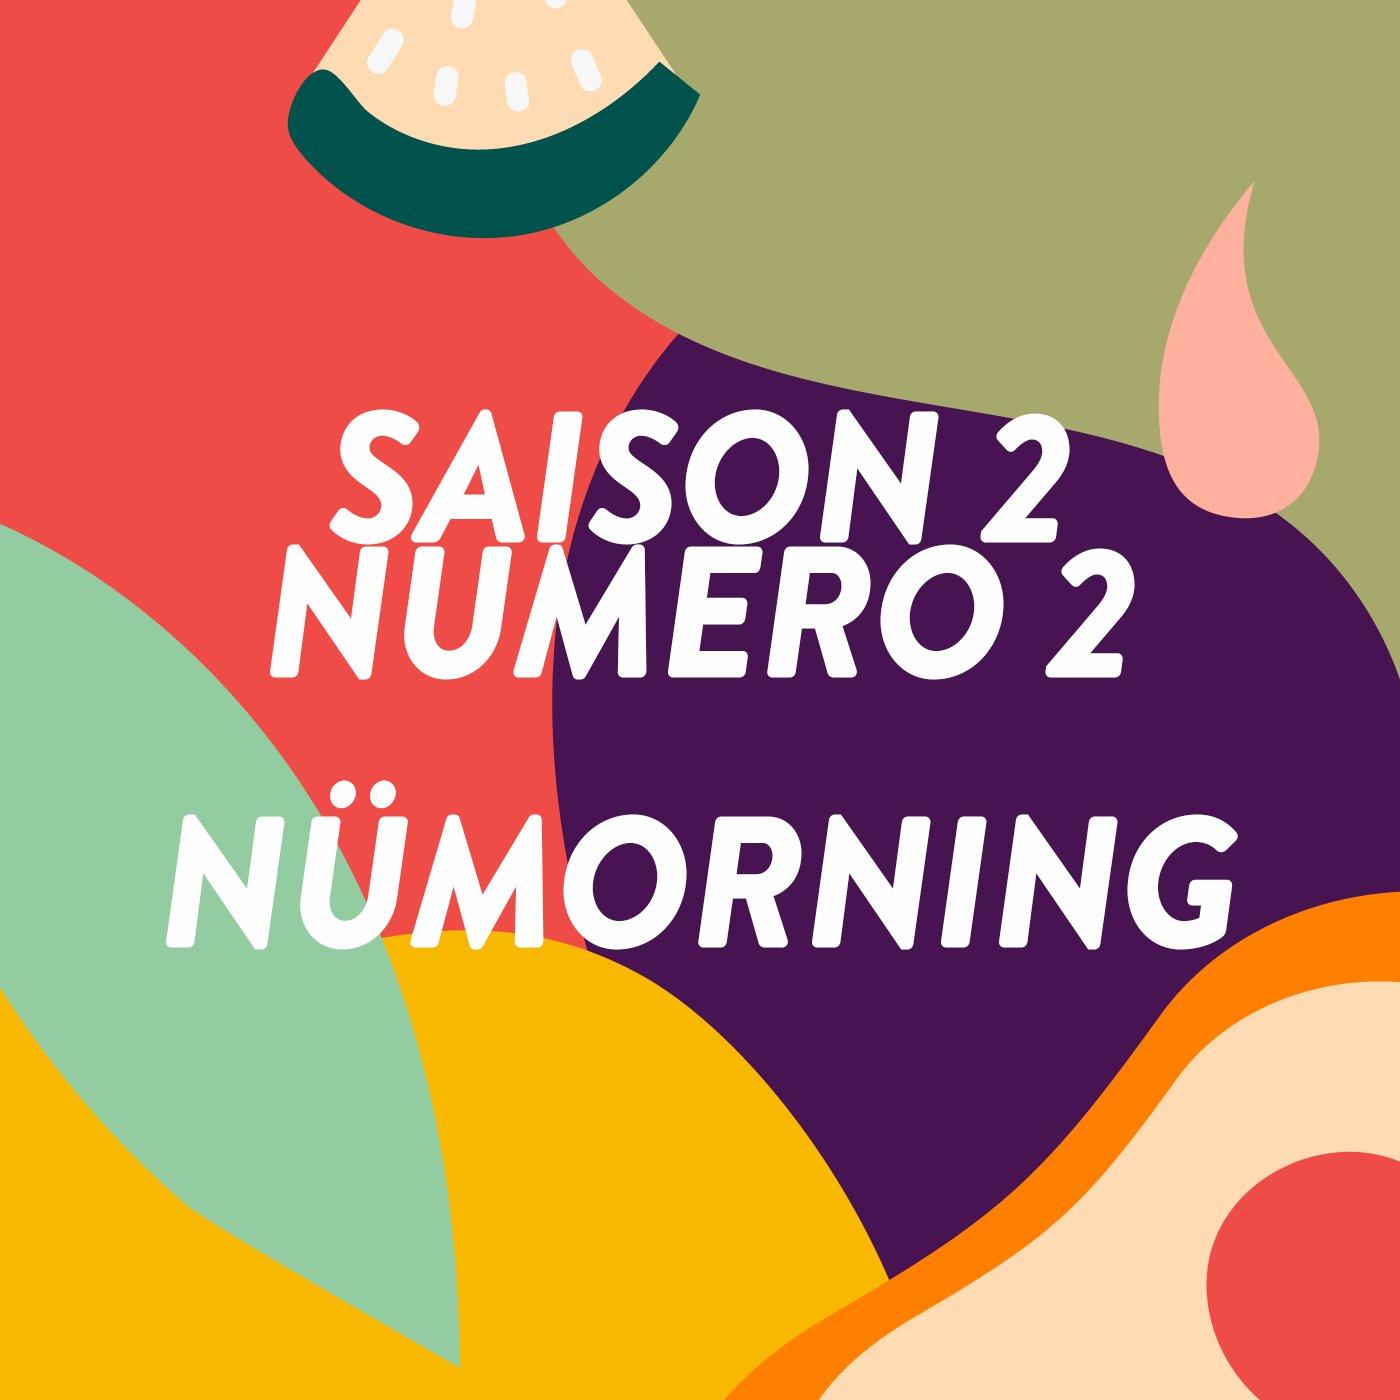 Nümorning / #2 S2